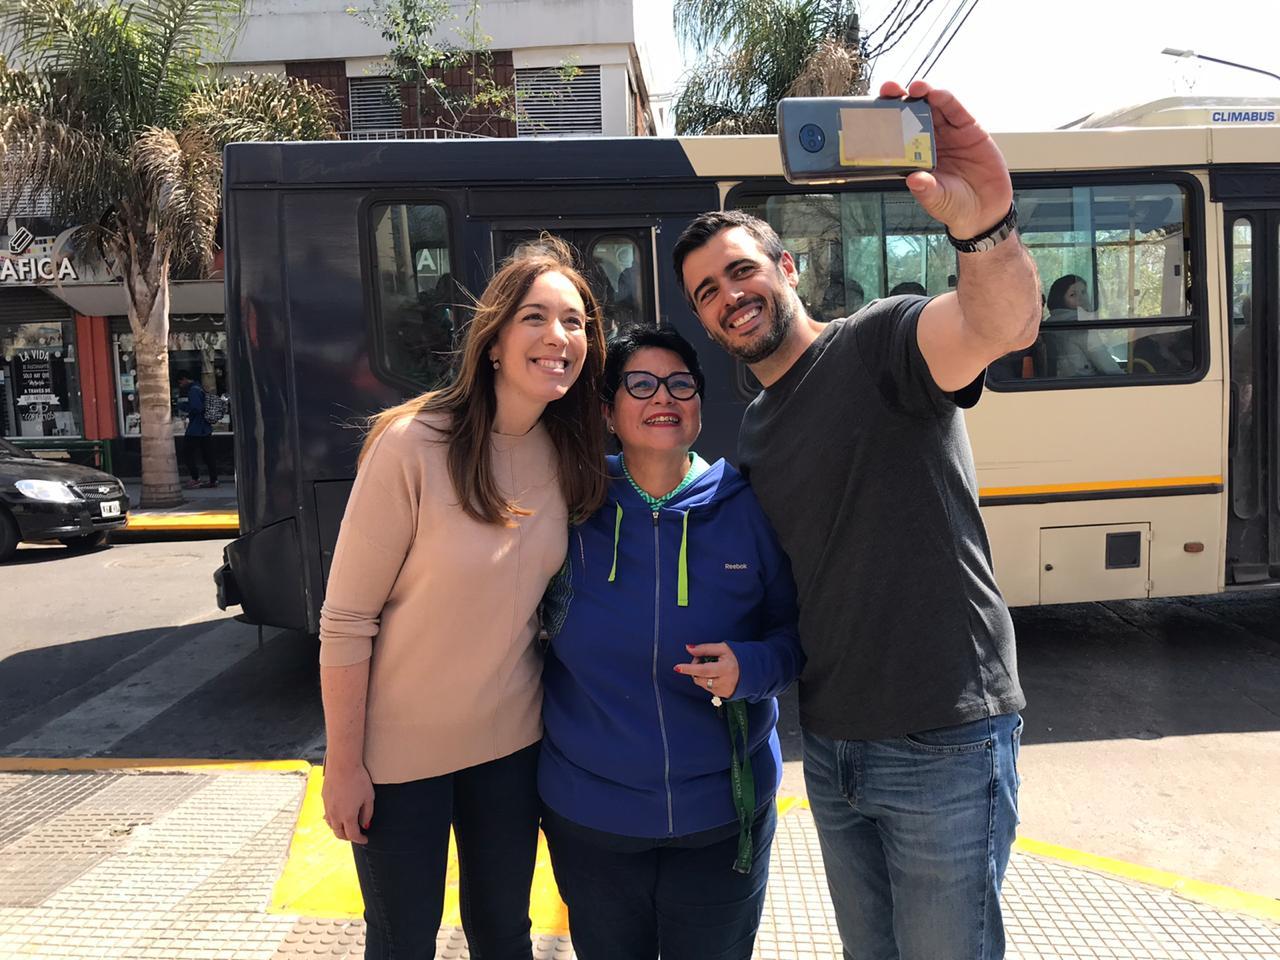 Escracharon a la Gobernadora Vidal hoy en Ituzaingó